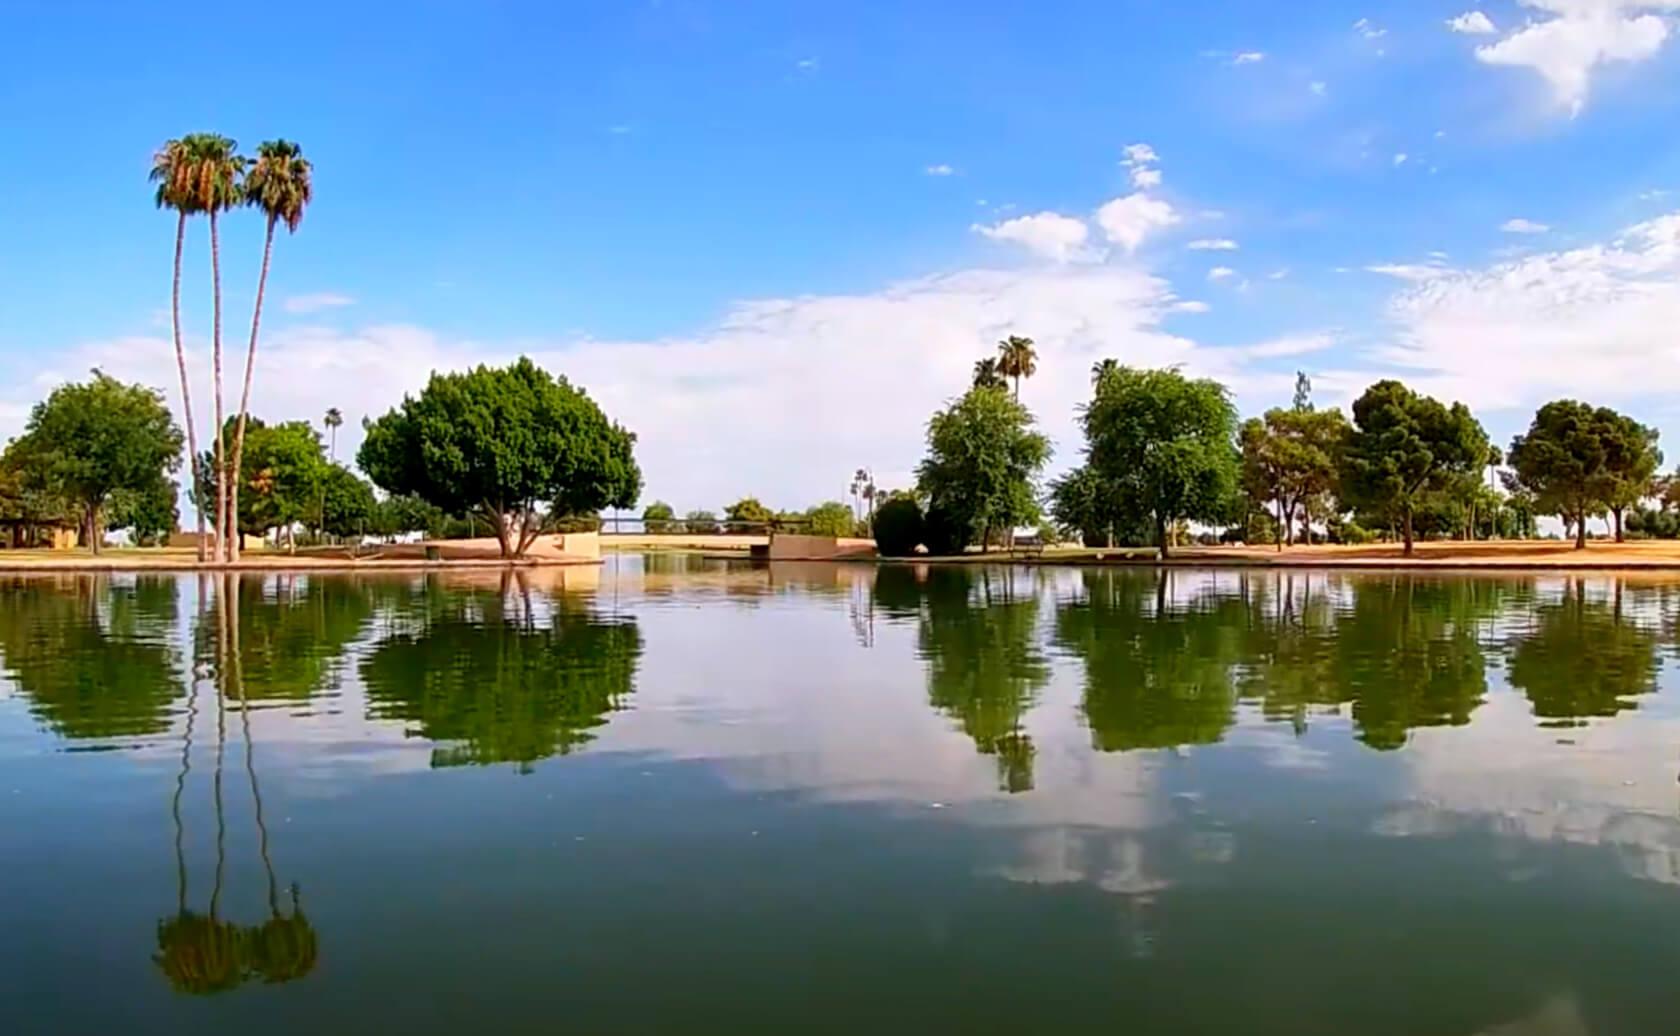 Alvord-Cesar-Chavez-Lake-fishing-guide-report-phoenix-az-03